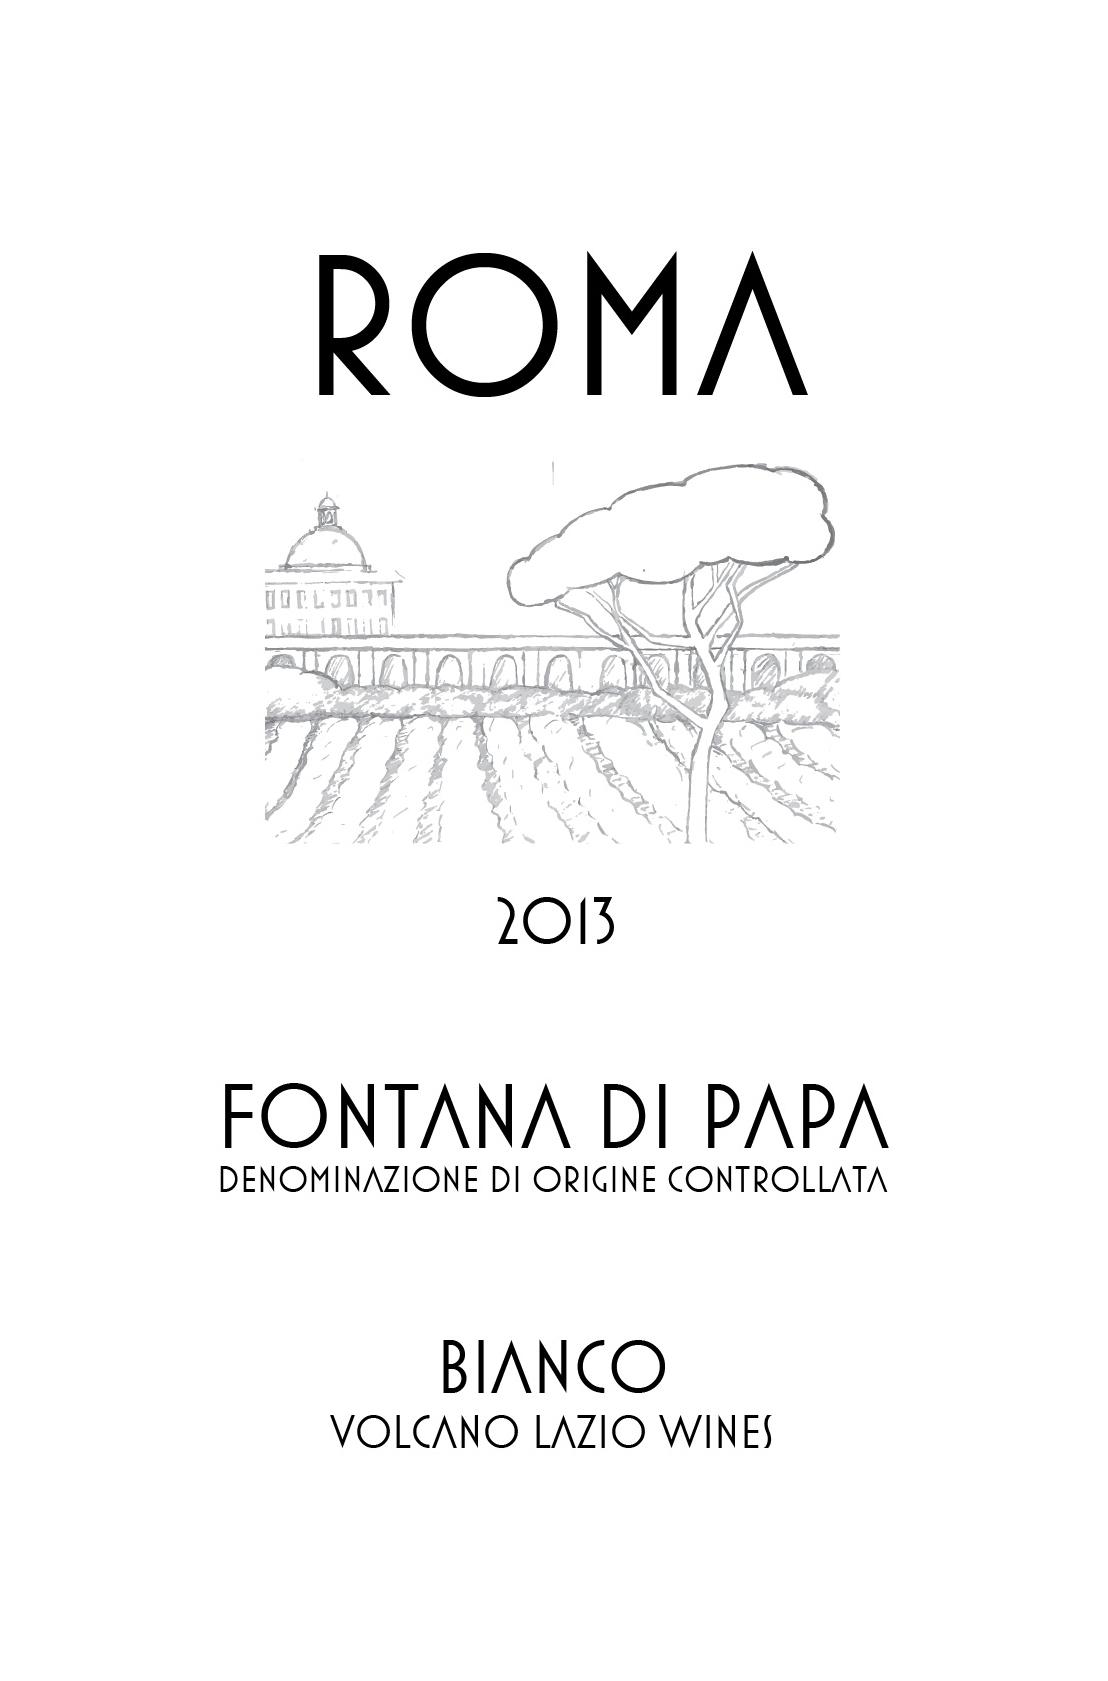 wine labels_Roma 2  copy 15.jpg